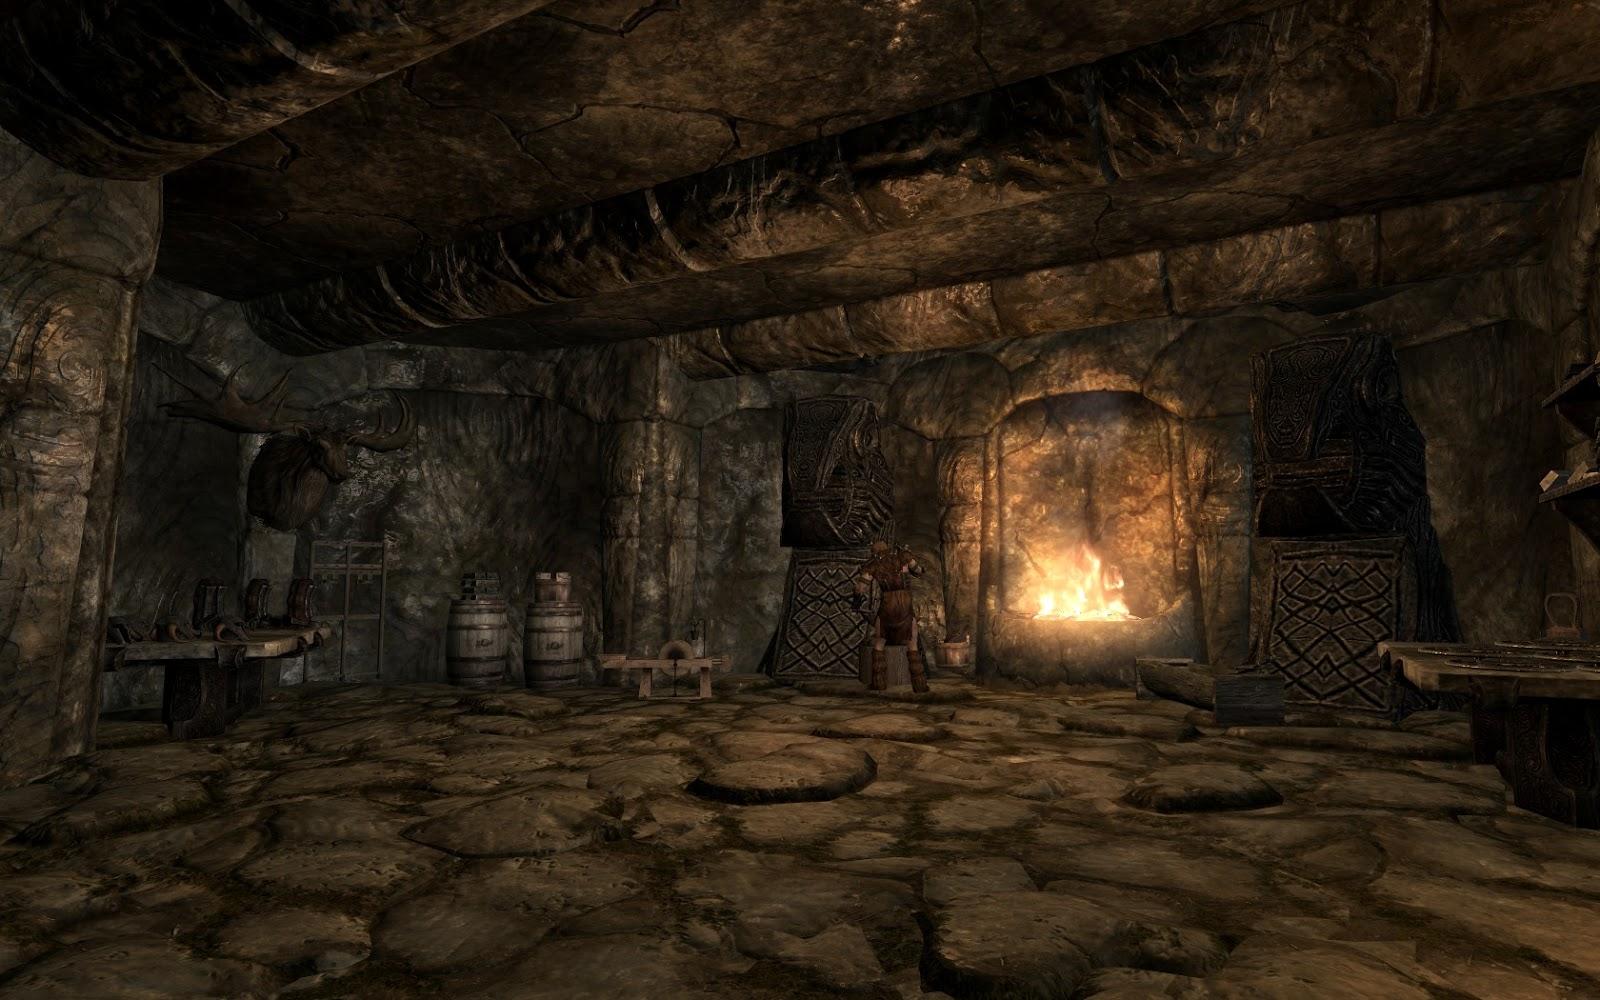 Dungeon iphone galleries 18